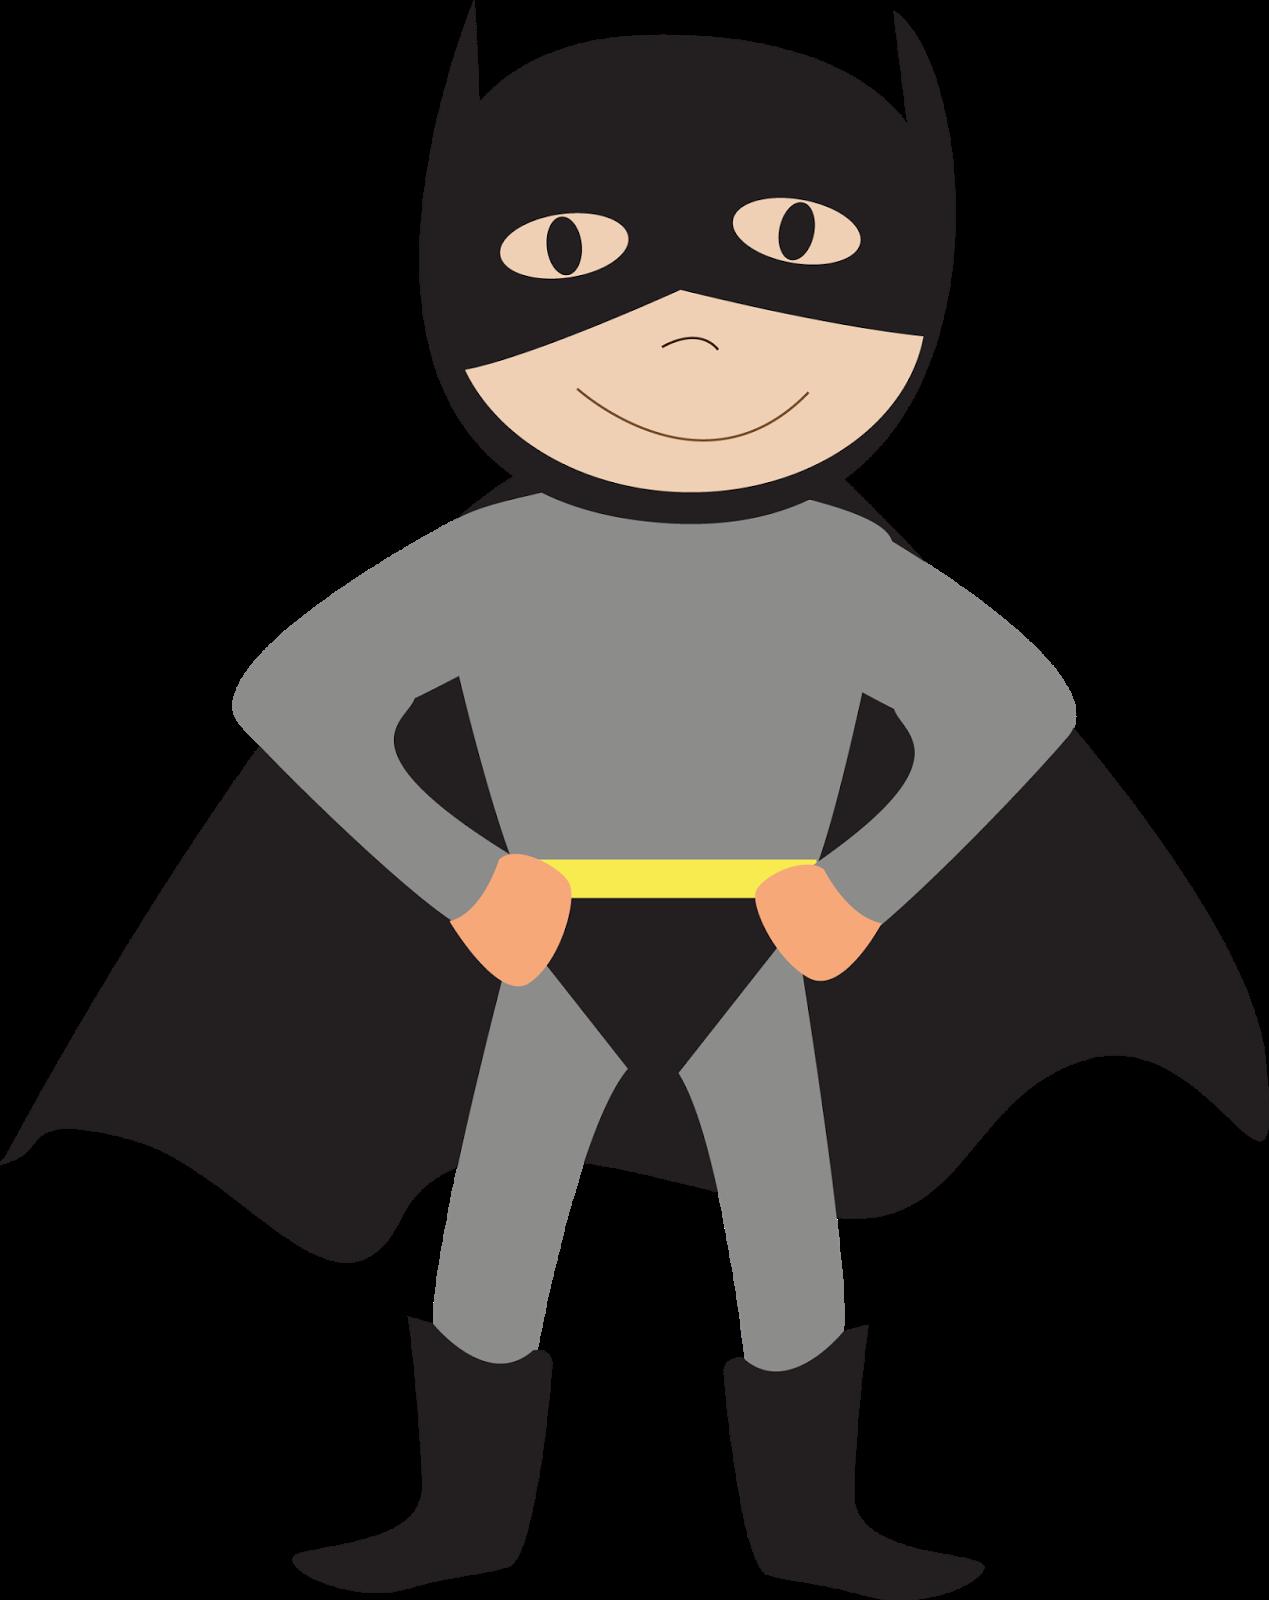 Halloween superheroes clipart jpg free library Baby Superheroes Clipart. - Oh My Fiesta! for Geeks jpg free library